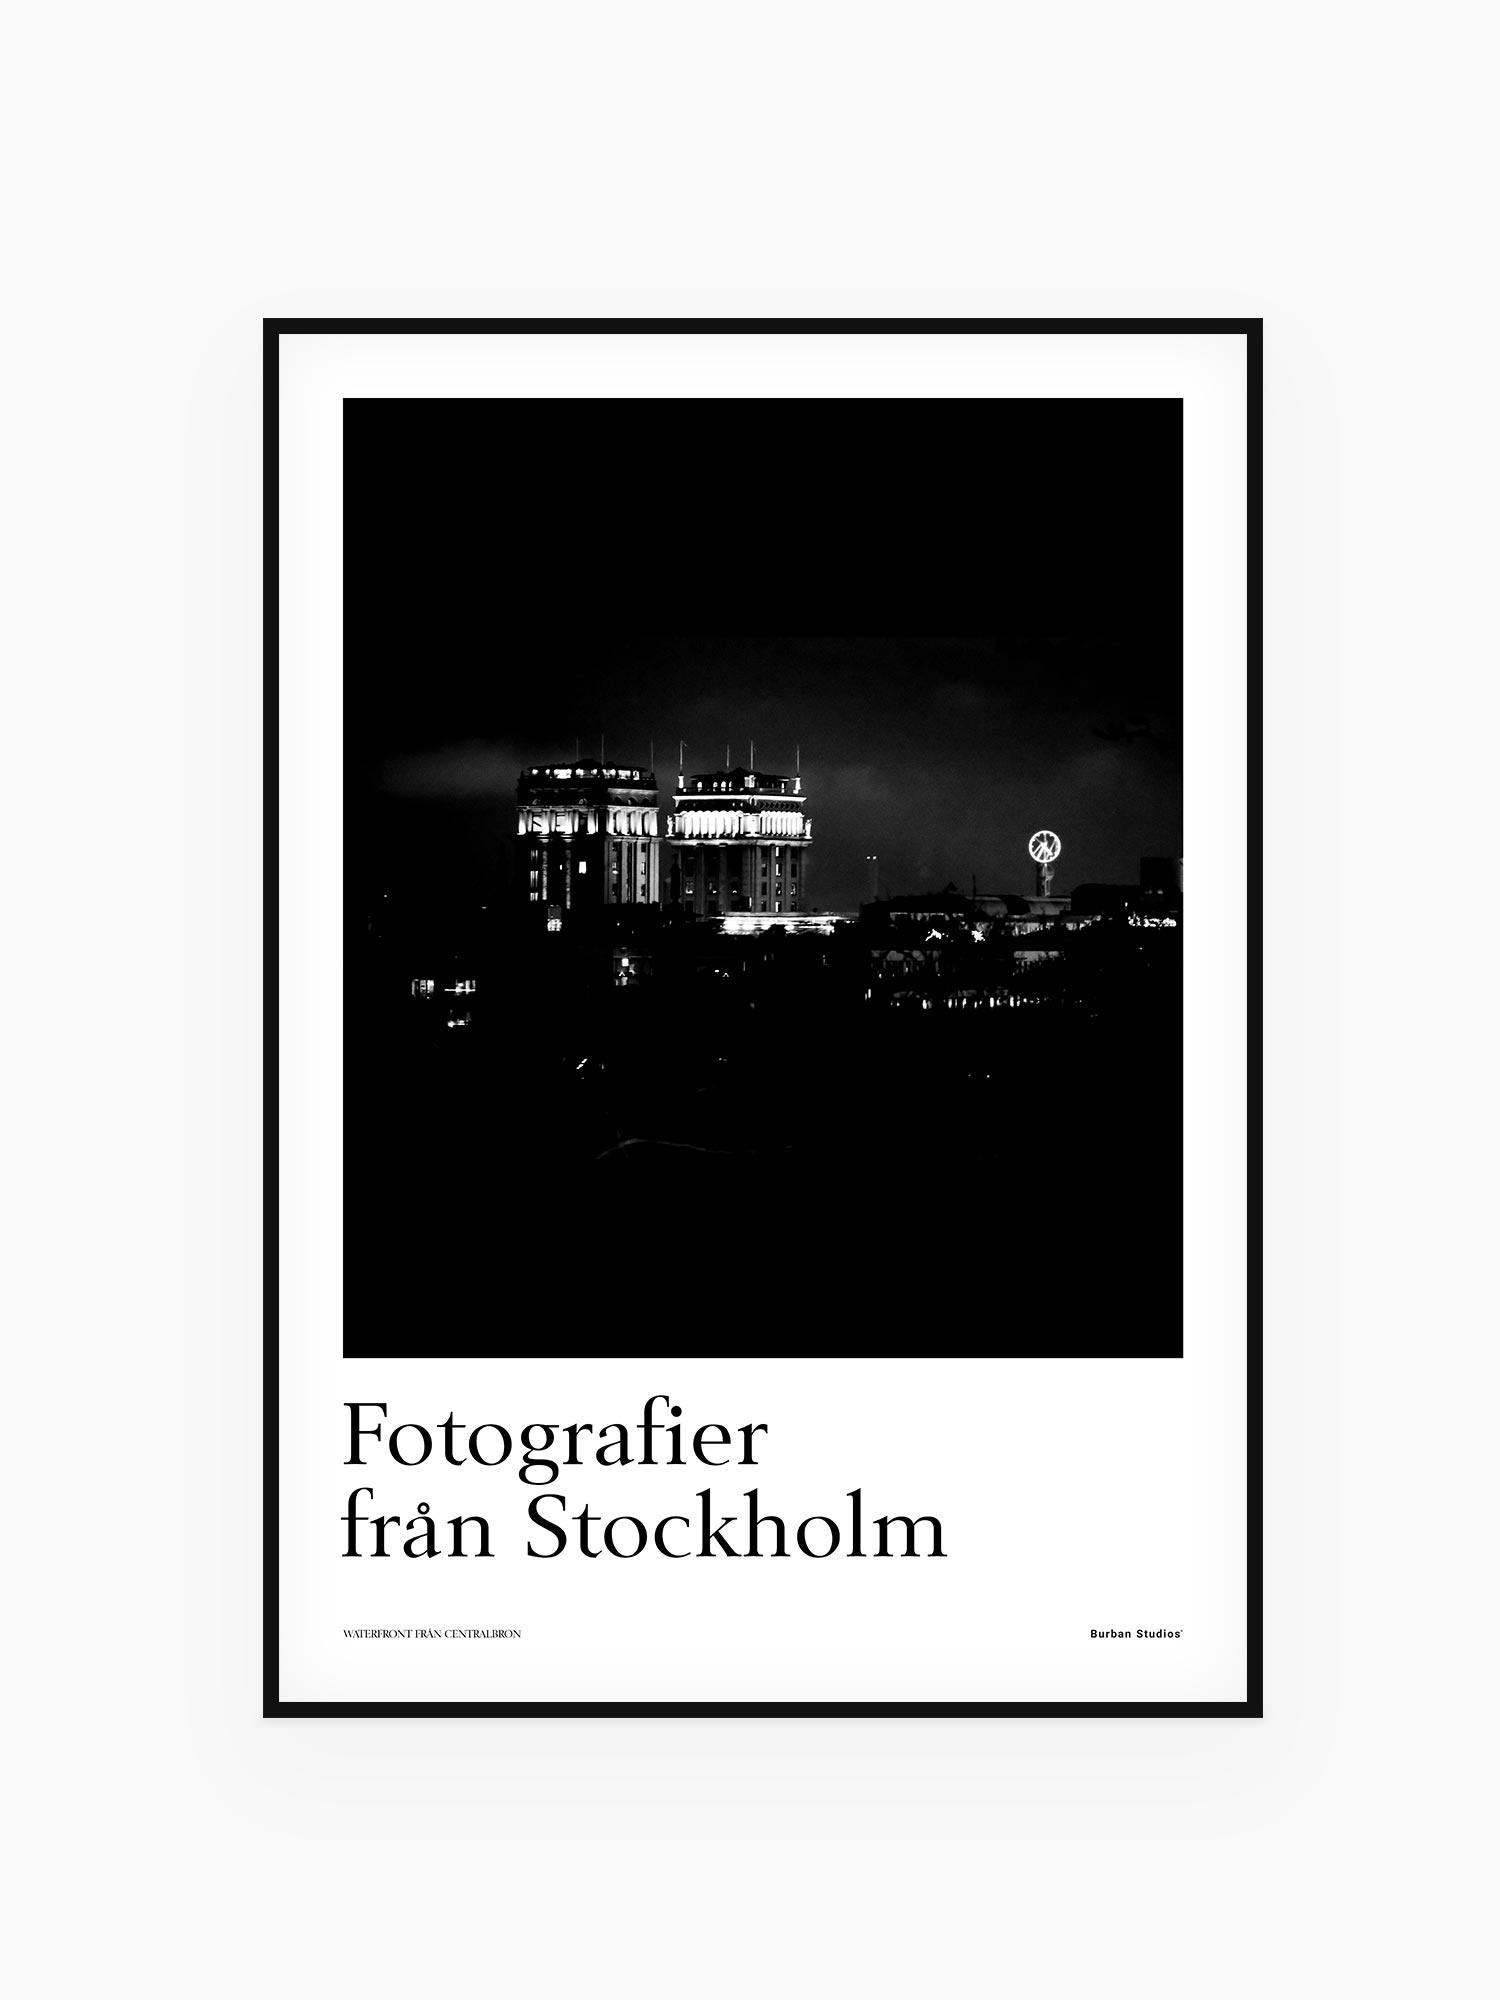 Kungstornen Stockholm tavla / poster / affisch - Burban Studios